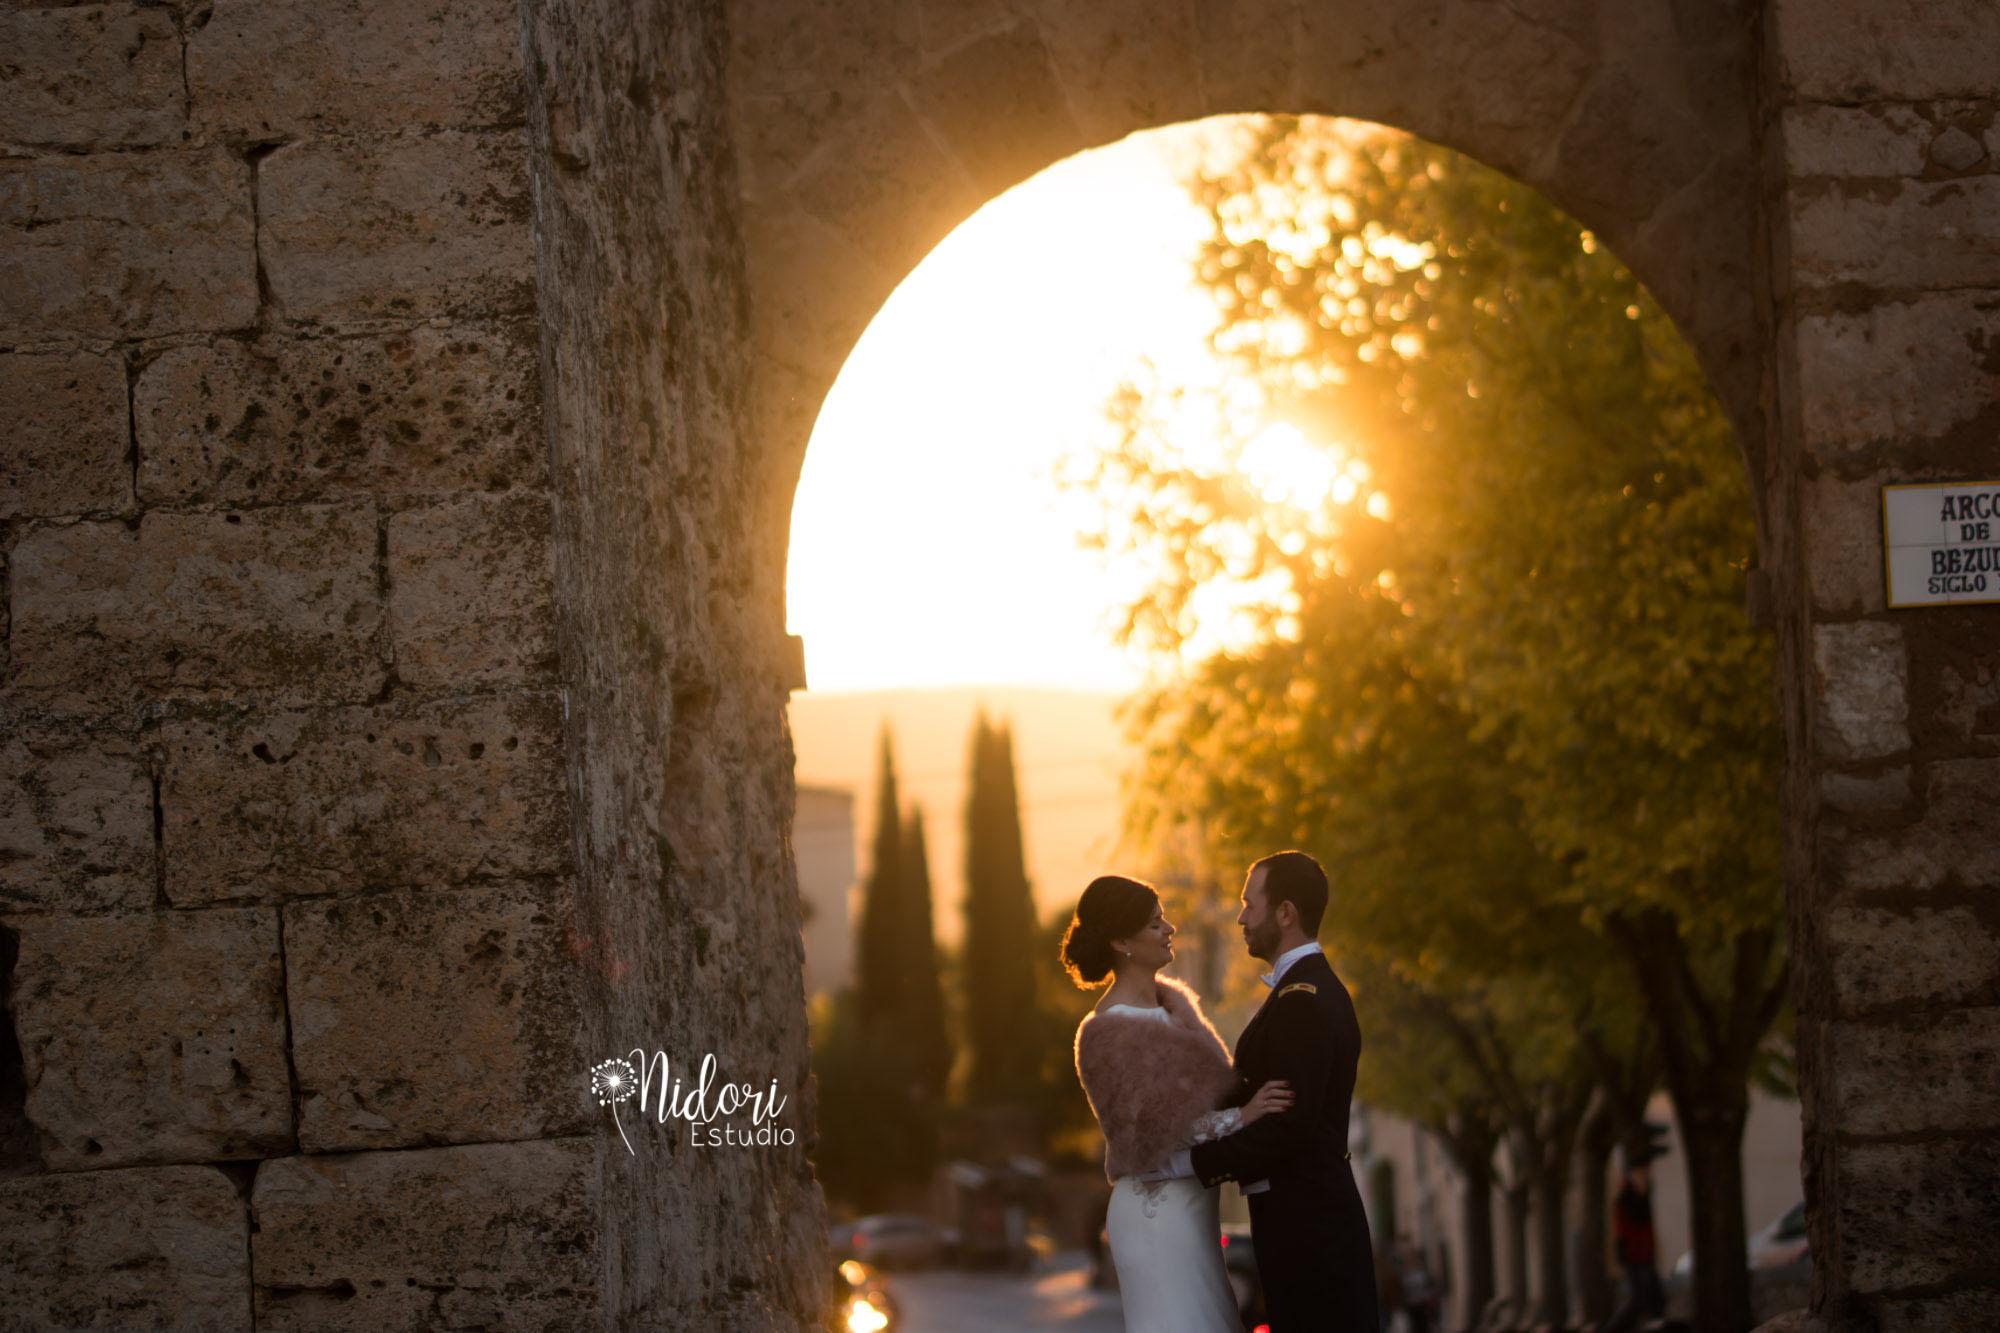 fotos-de-boda-reportaje-novios-fotografia-boda-nidoriestudio-fotos-valencia-almazora-castellon-españa-spain-033